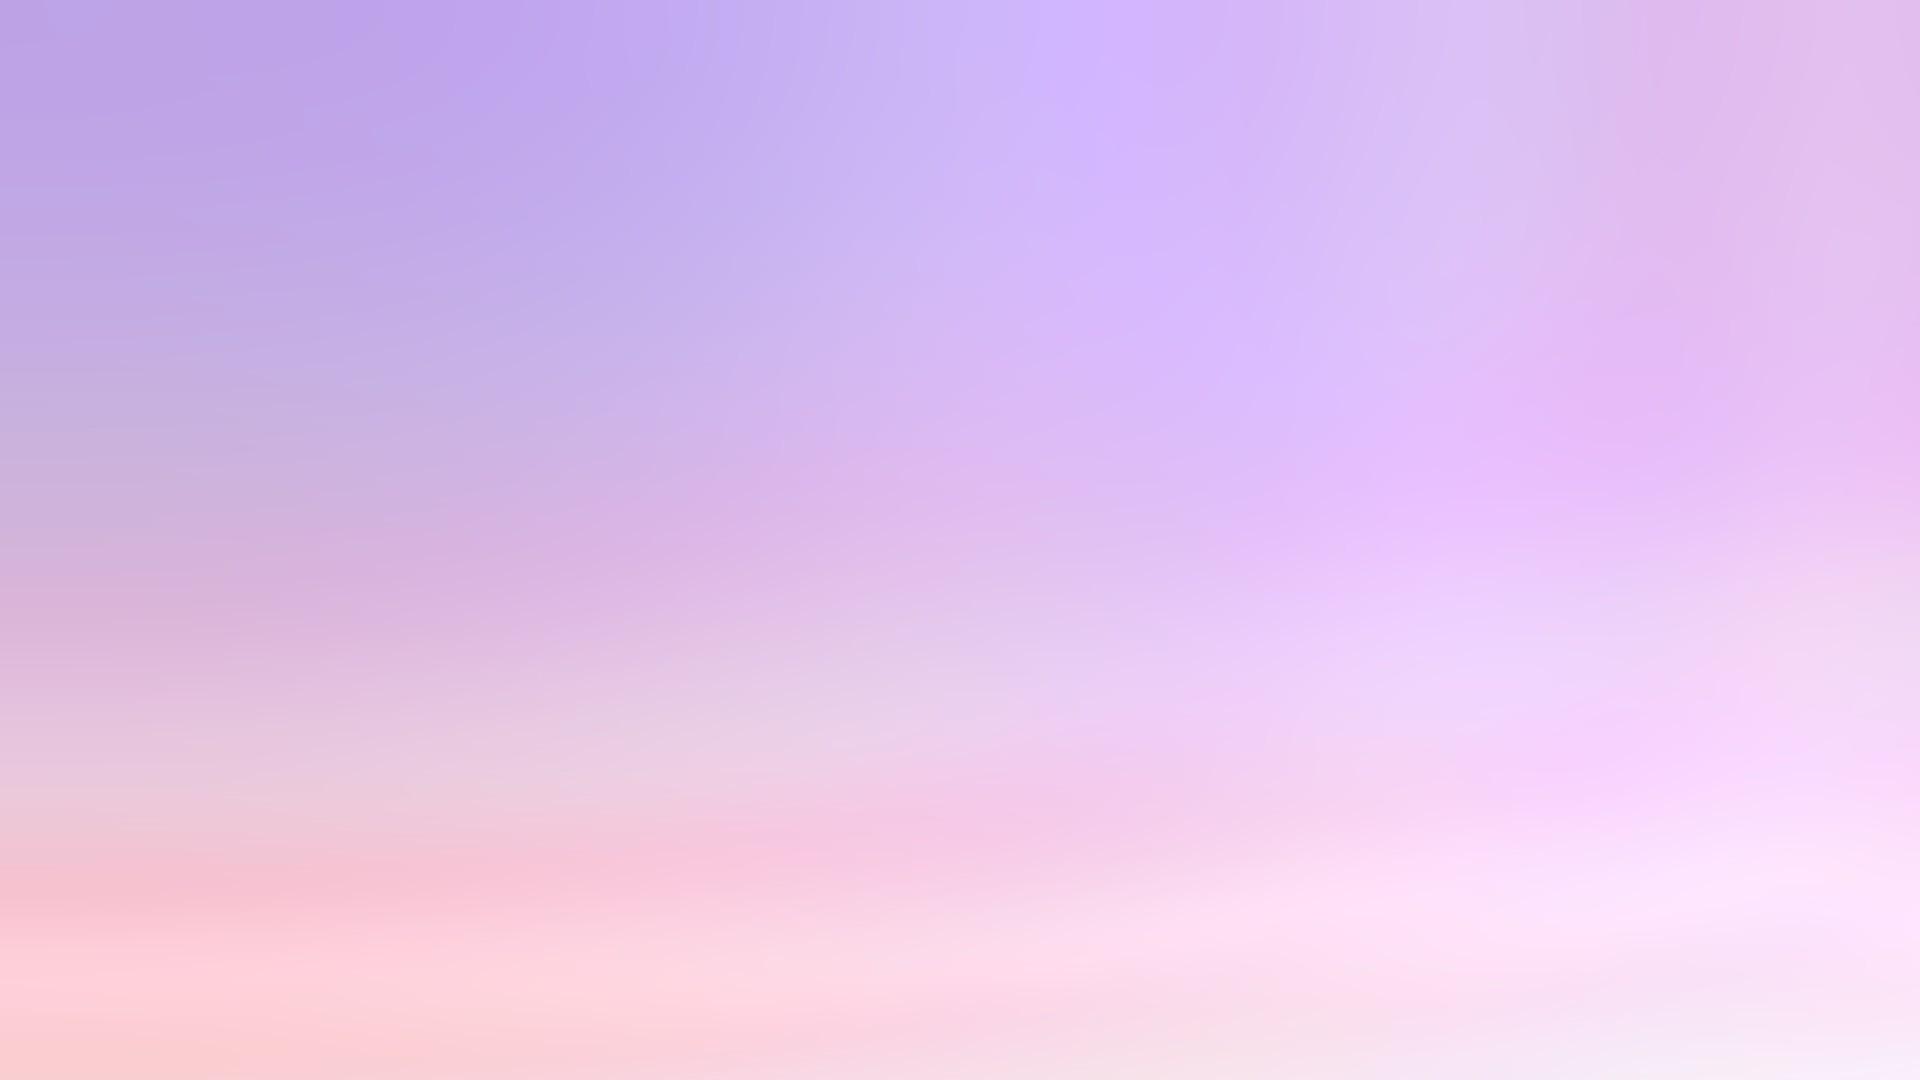 … Light Pink Backgrounds Wallpapersafari Remodel My Kitchen Pretty Flower  Arrangements Types Of Window Blinds Pastel Color …